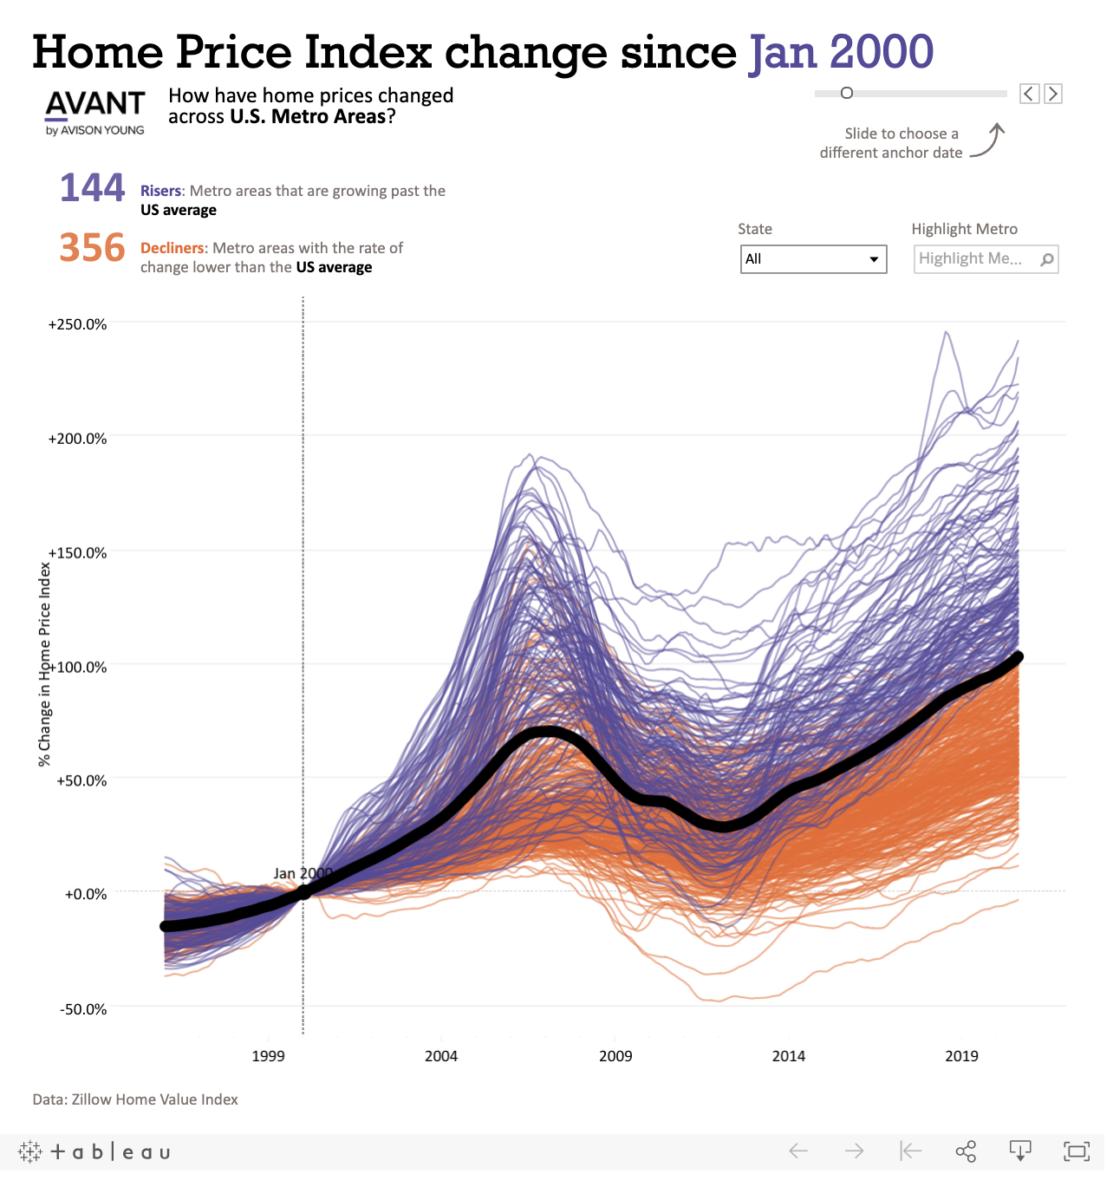 Peak Suburban House Prices? 1